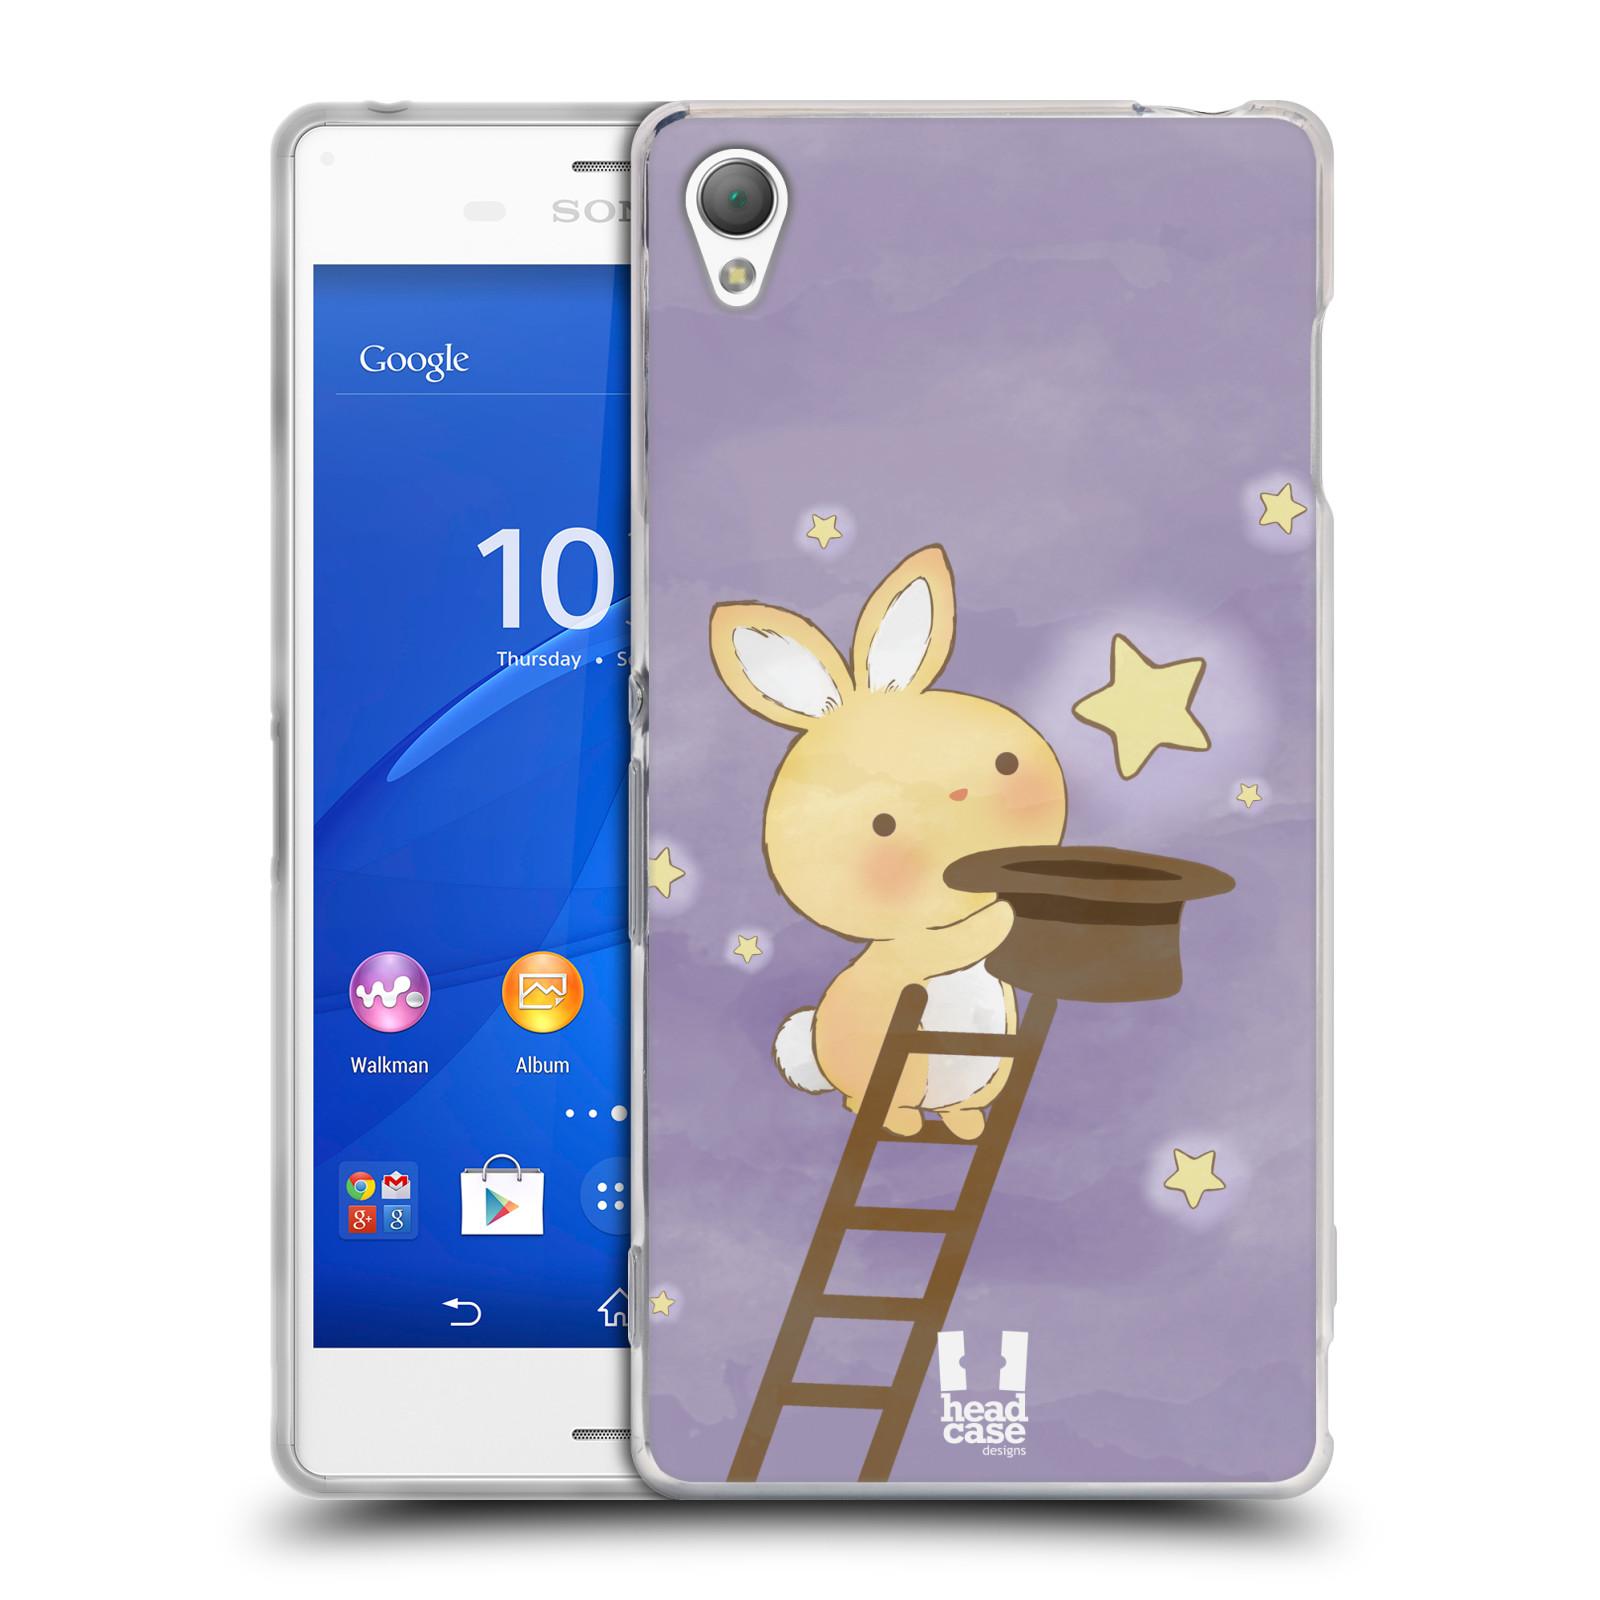 HEAD CASE silikonový obal na mobil Sony Xperia Z3 vzor králíček a hvězdy fialová